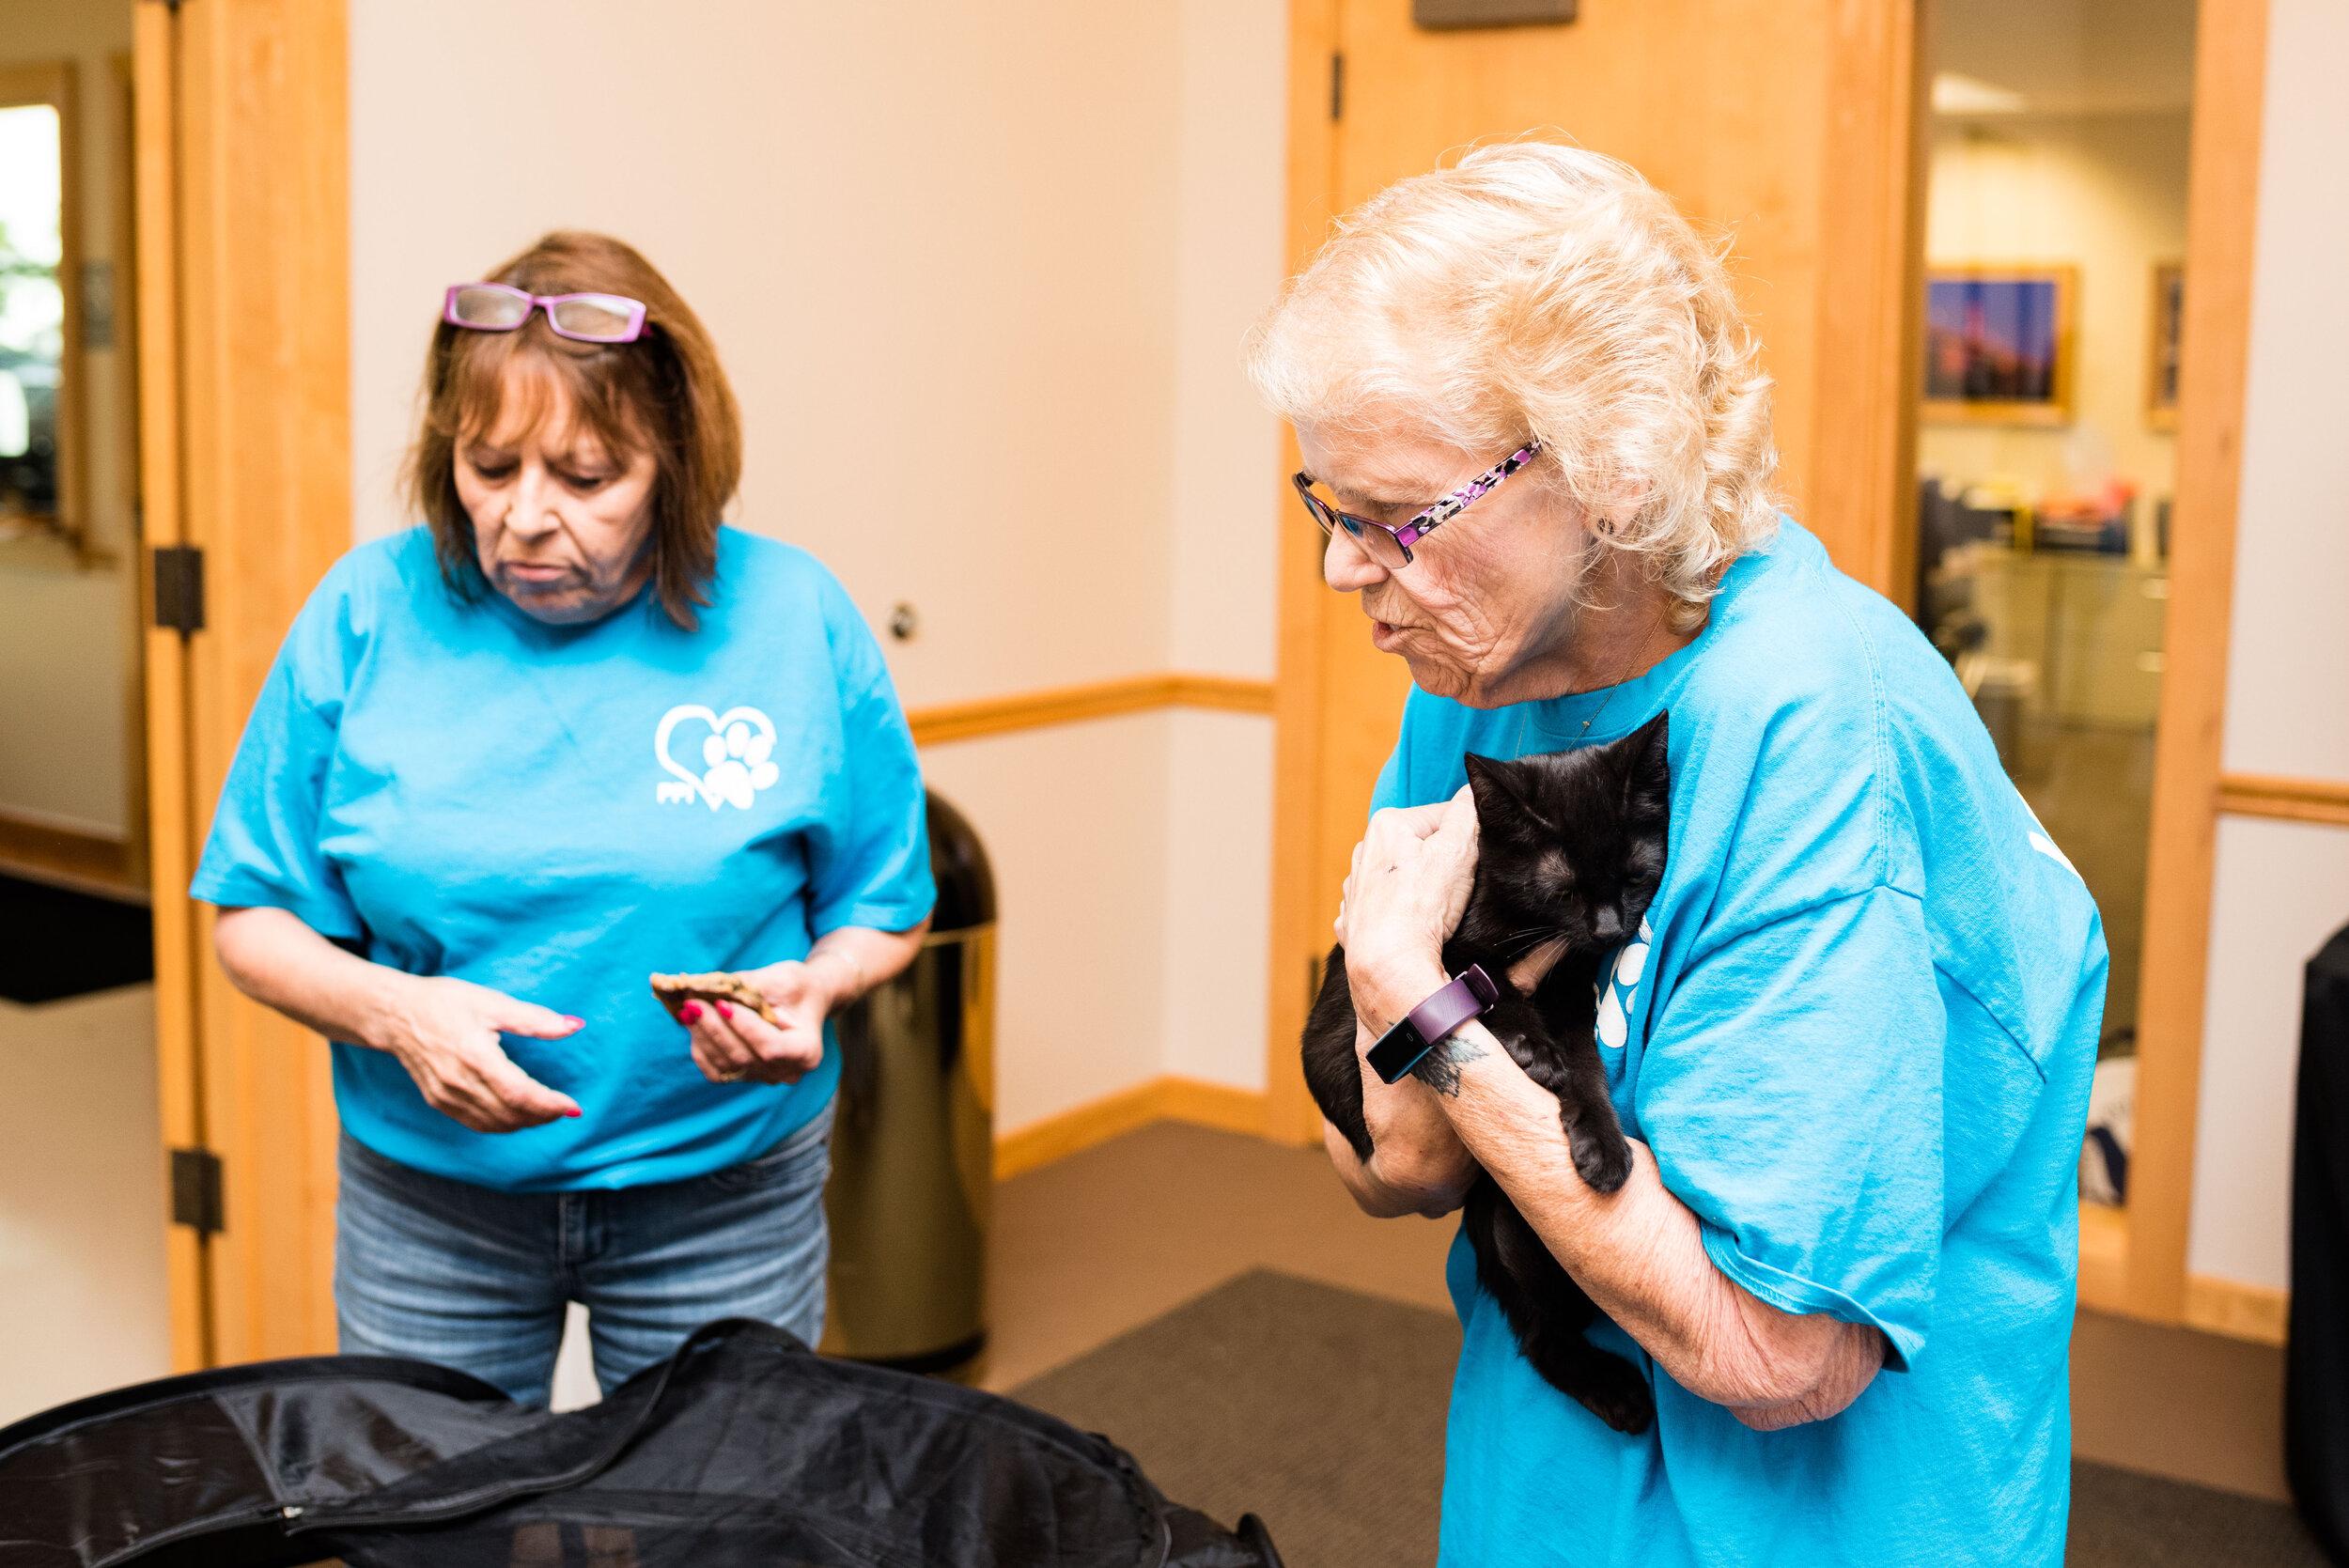 toledo area pet photography pet adoption-35.jpg